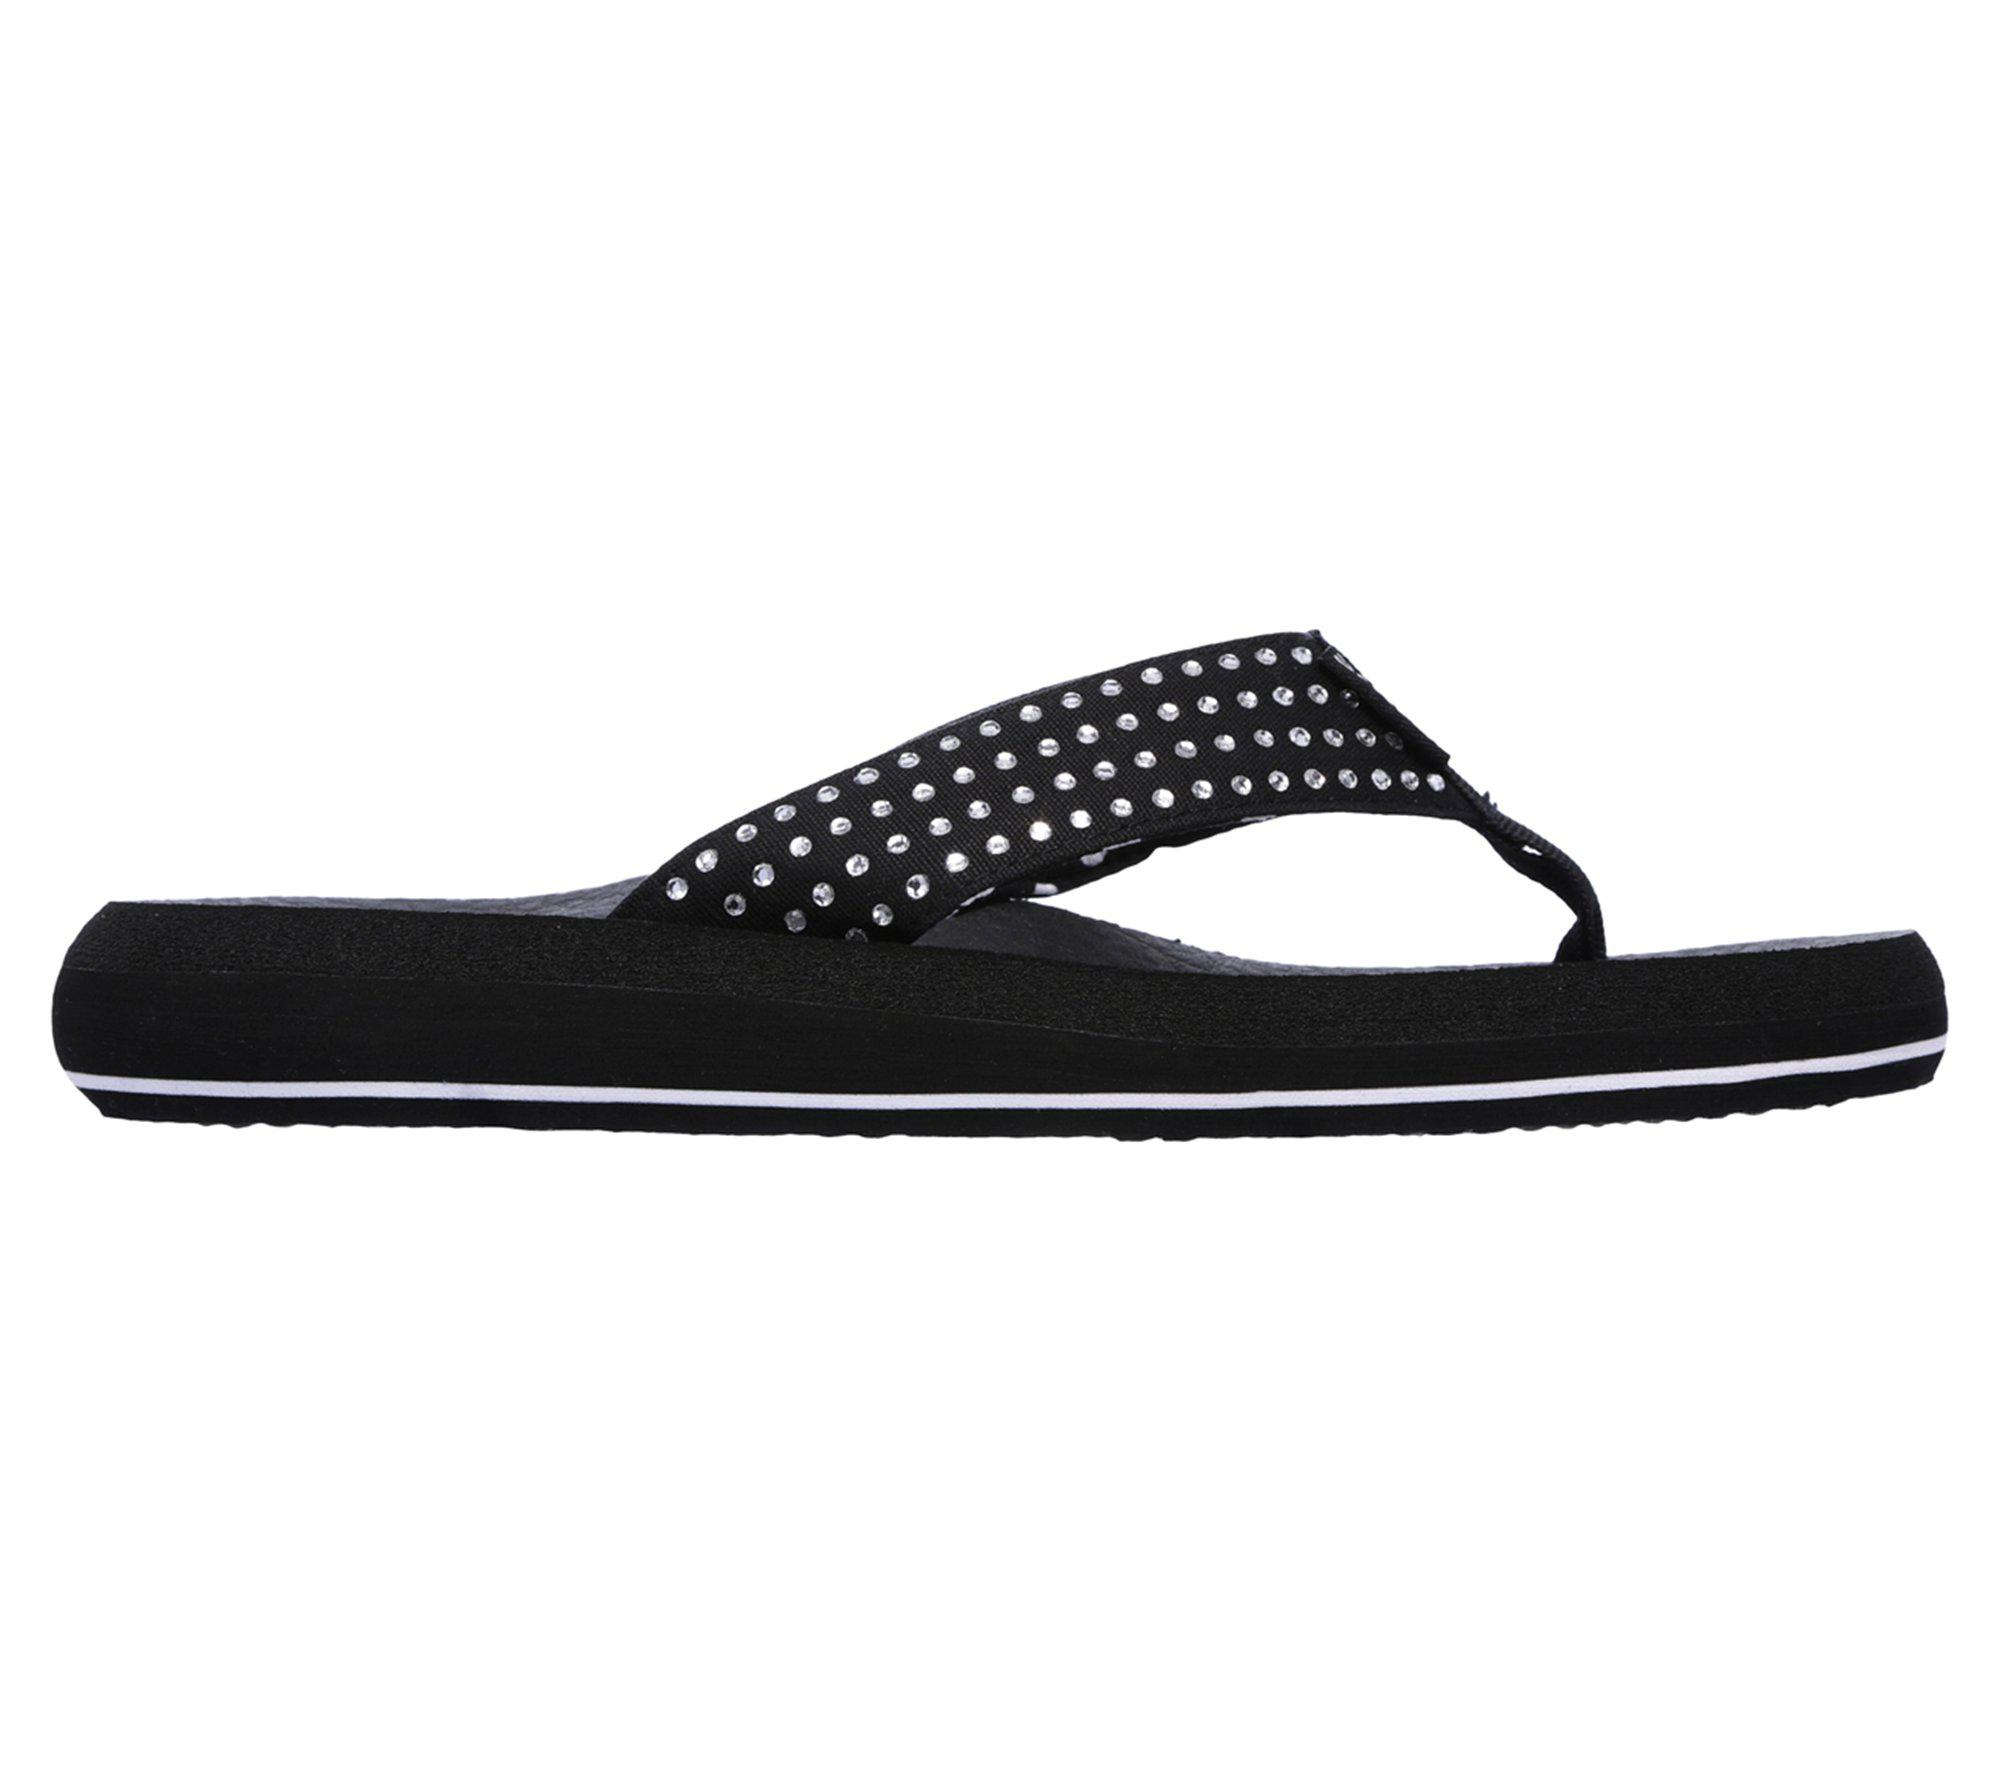 e14543abf53b Lyst - Skechers Asana - New Age in Black